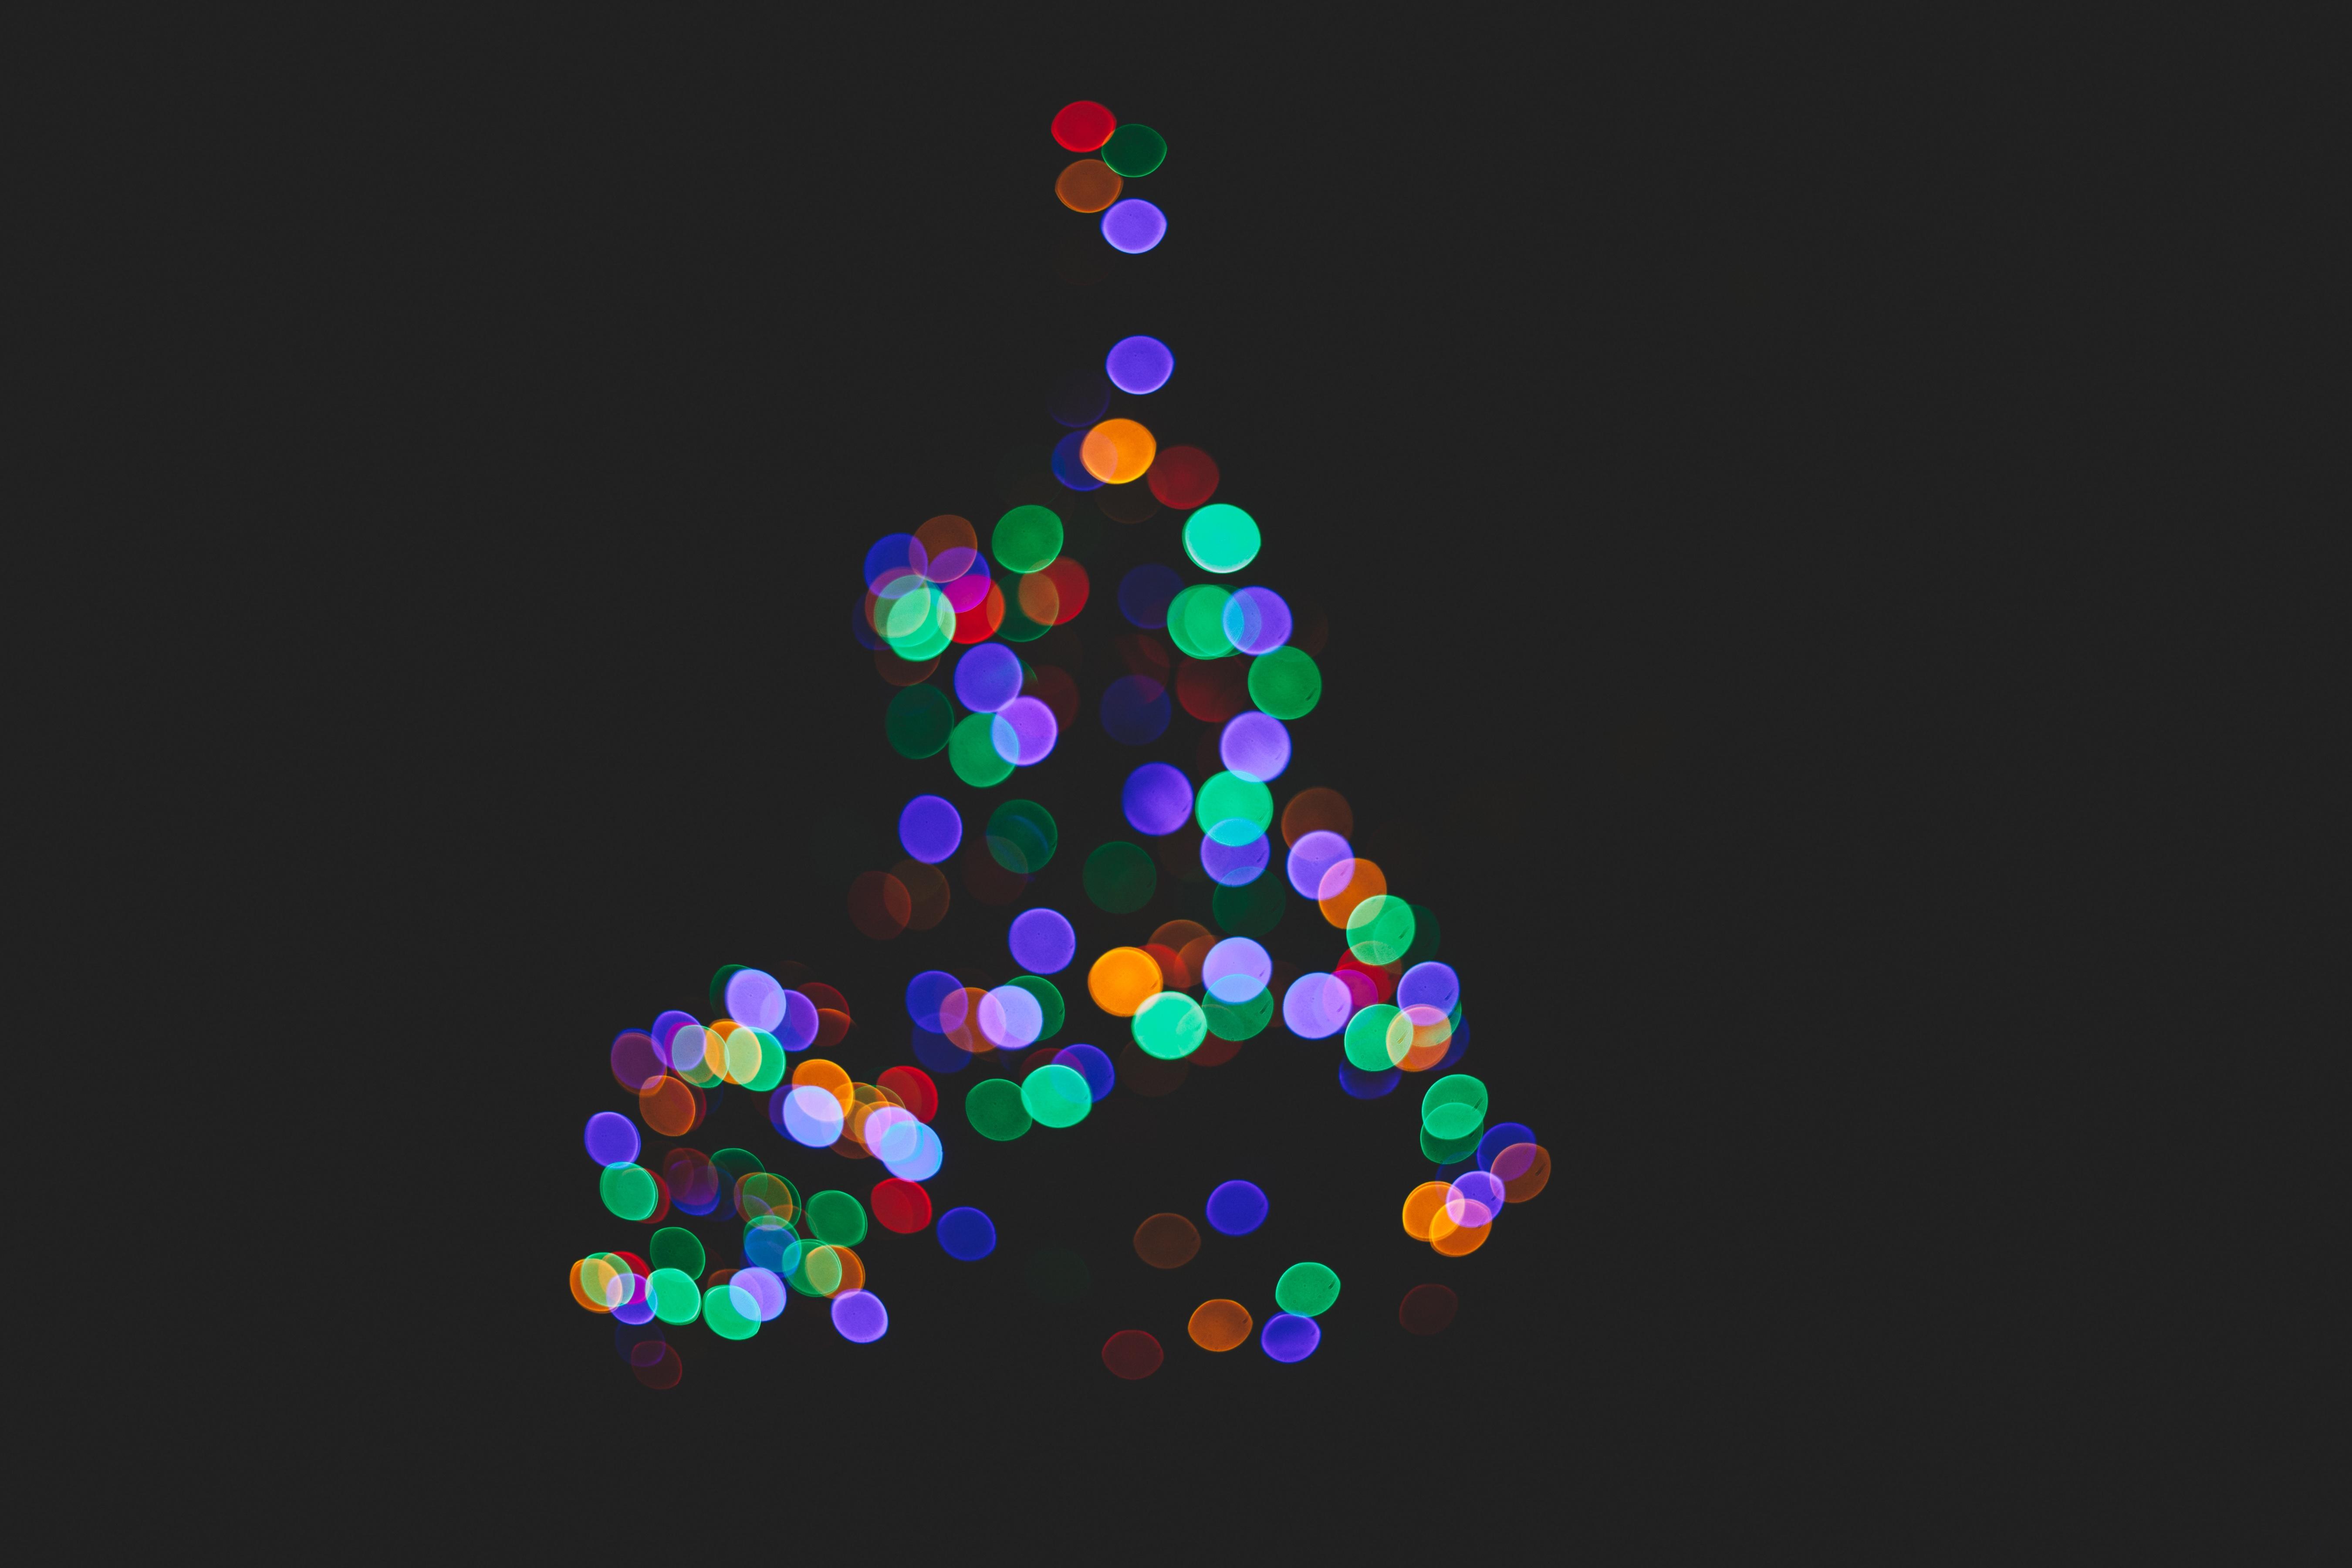 free images light bokeh petal pattern black decor christmas